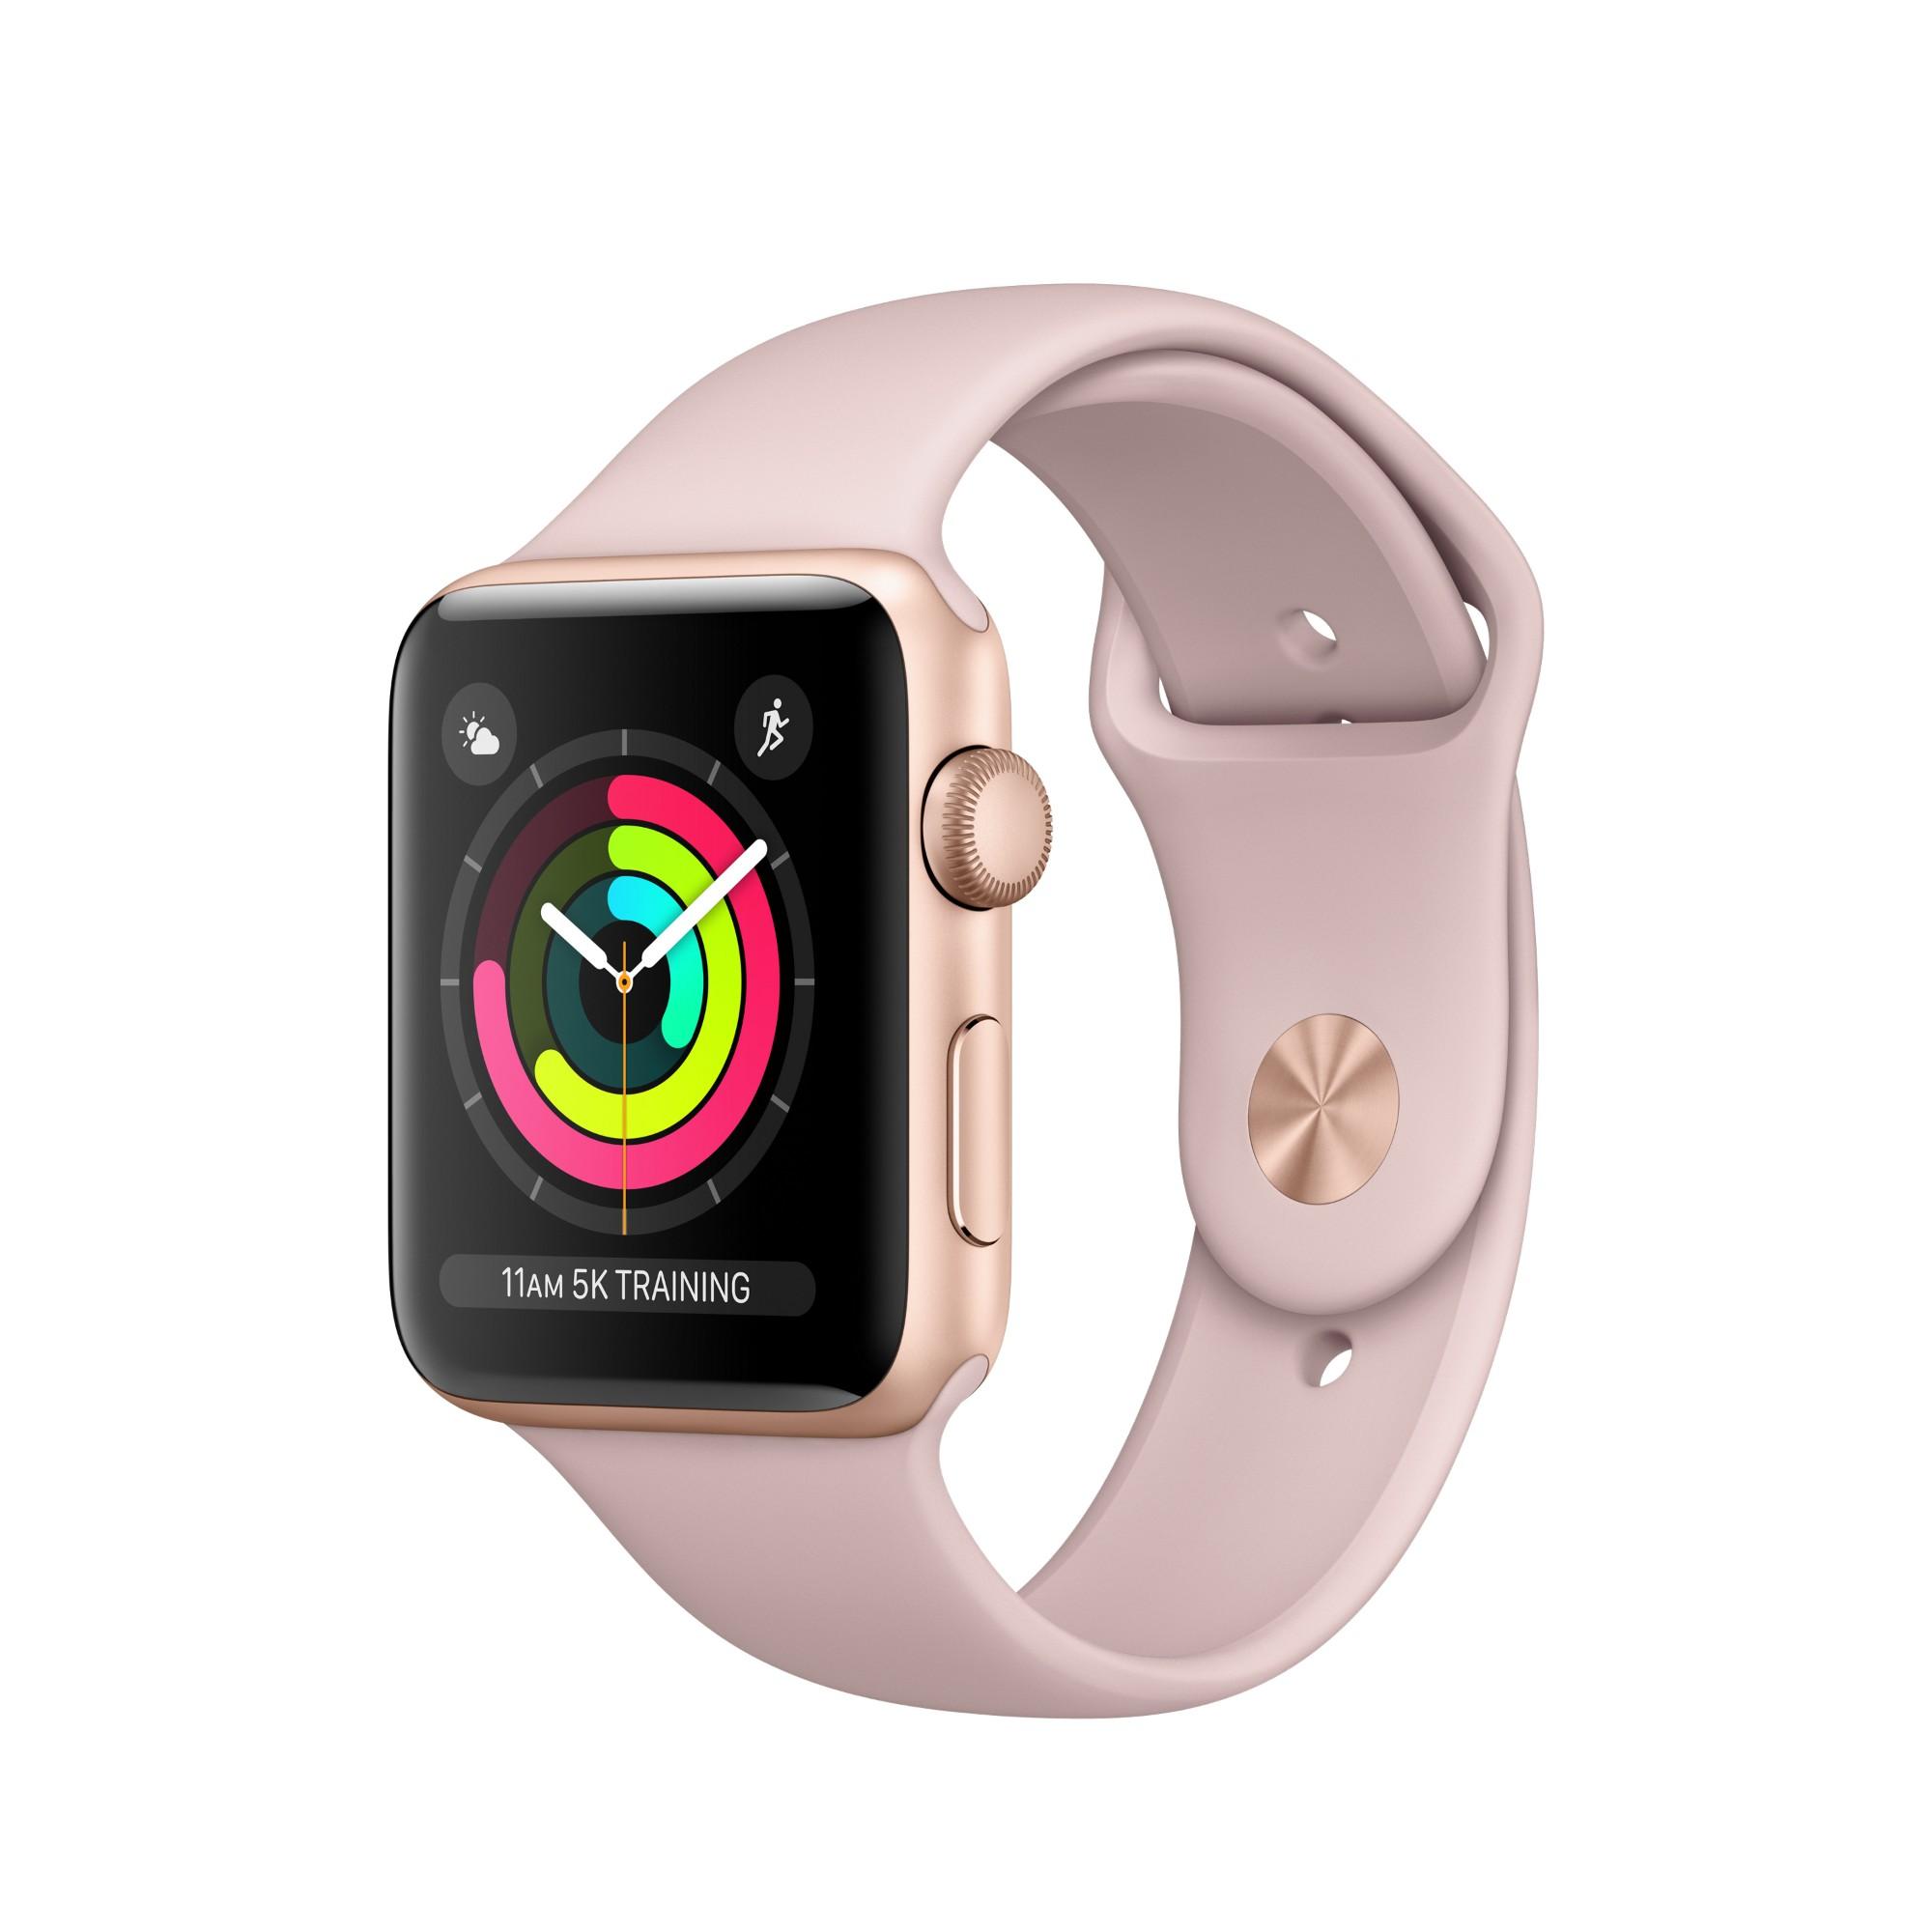 Apple Watch Series 3 OLED GPS (satellite) Gold smartwatch